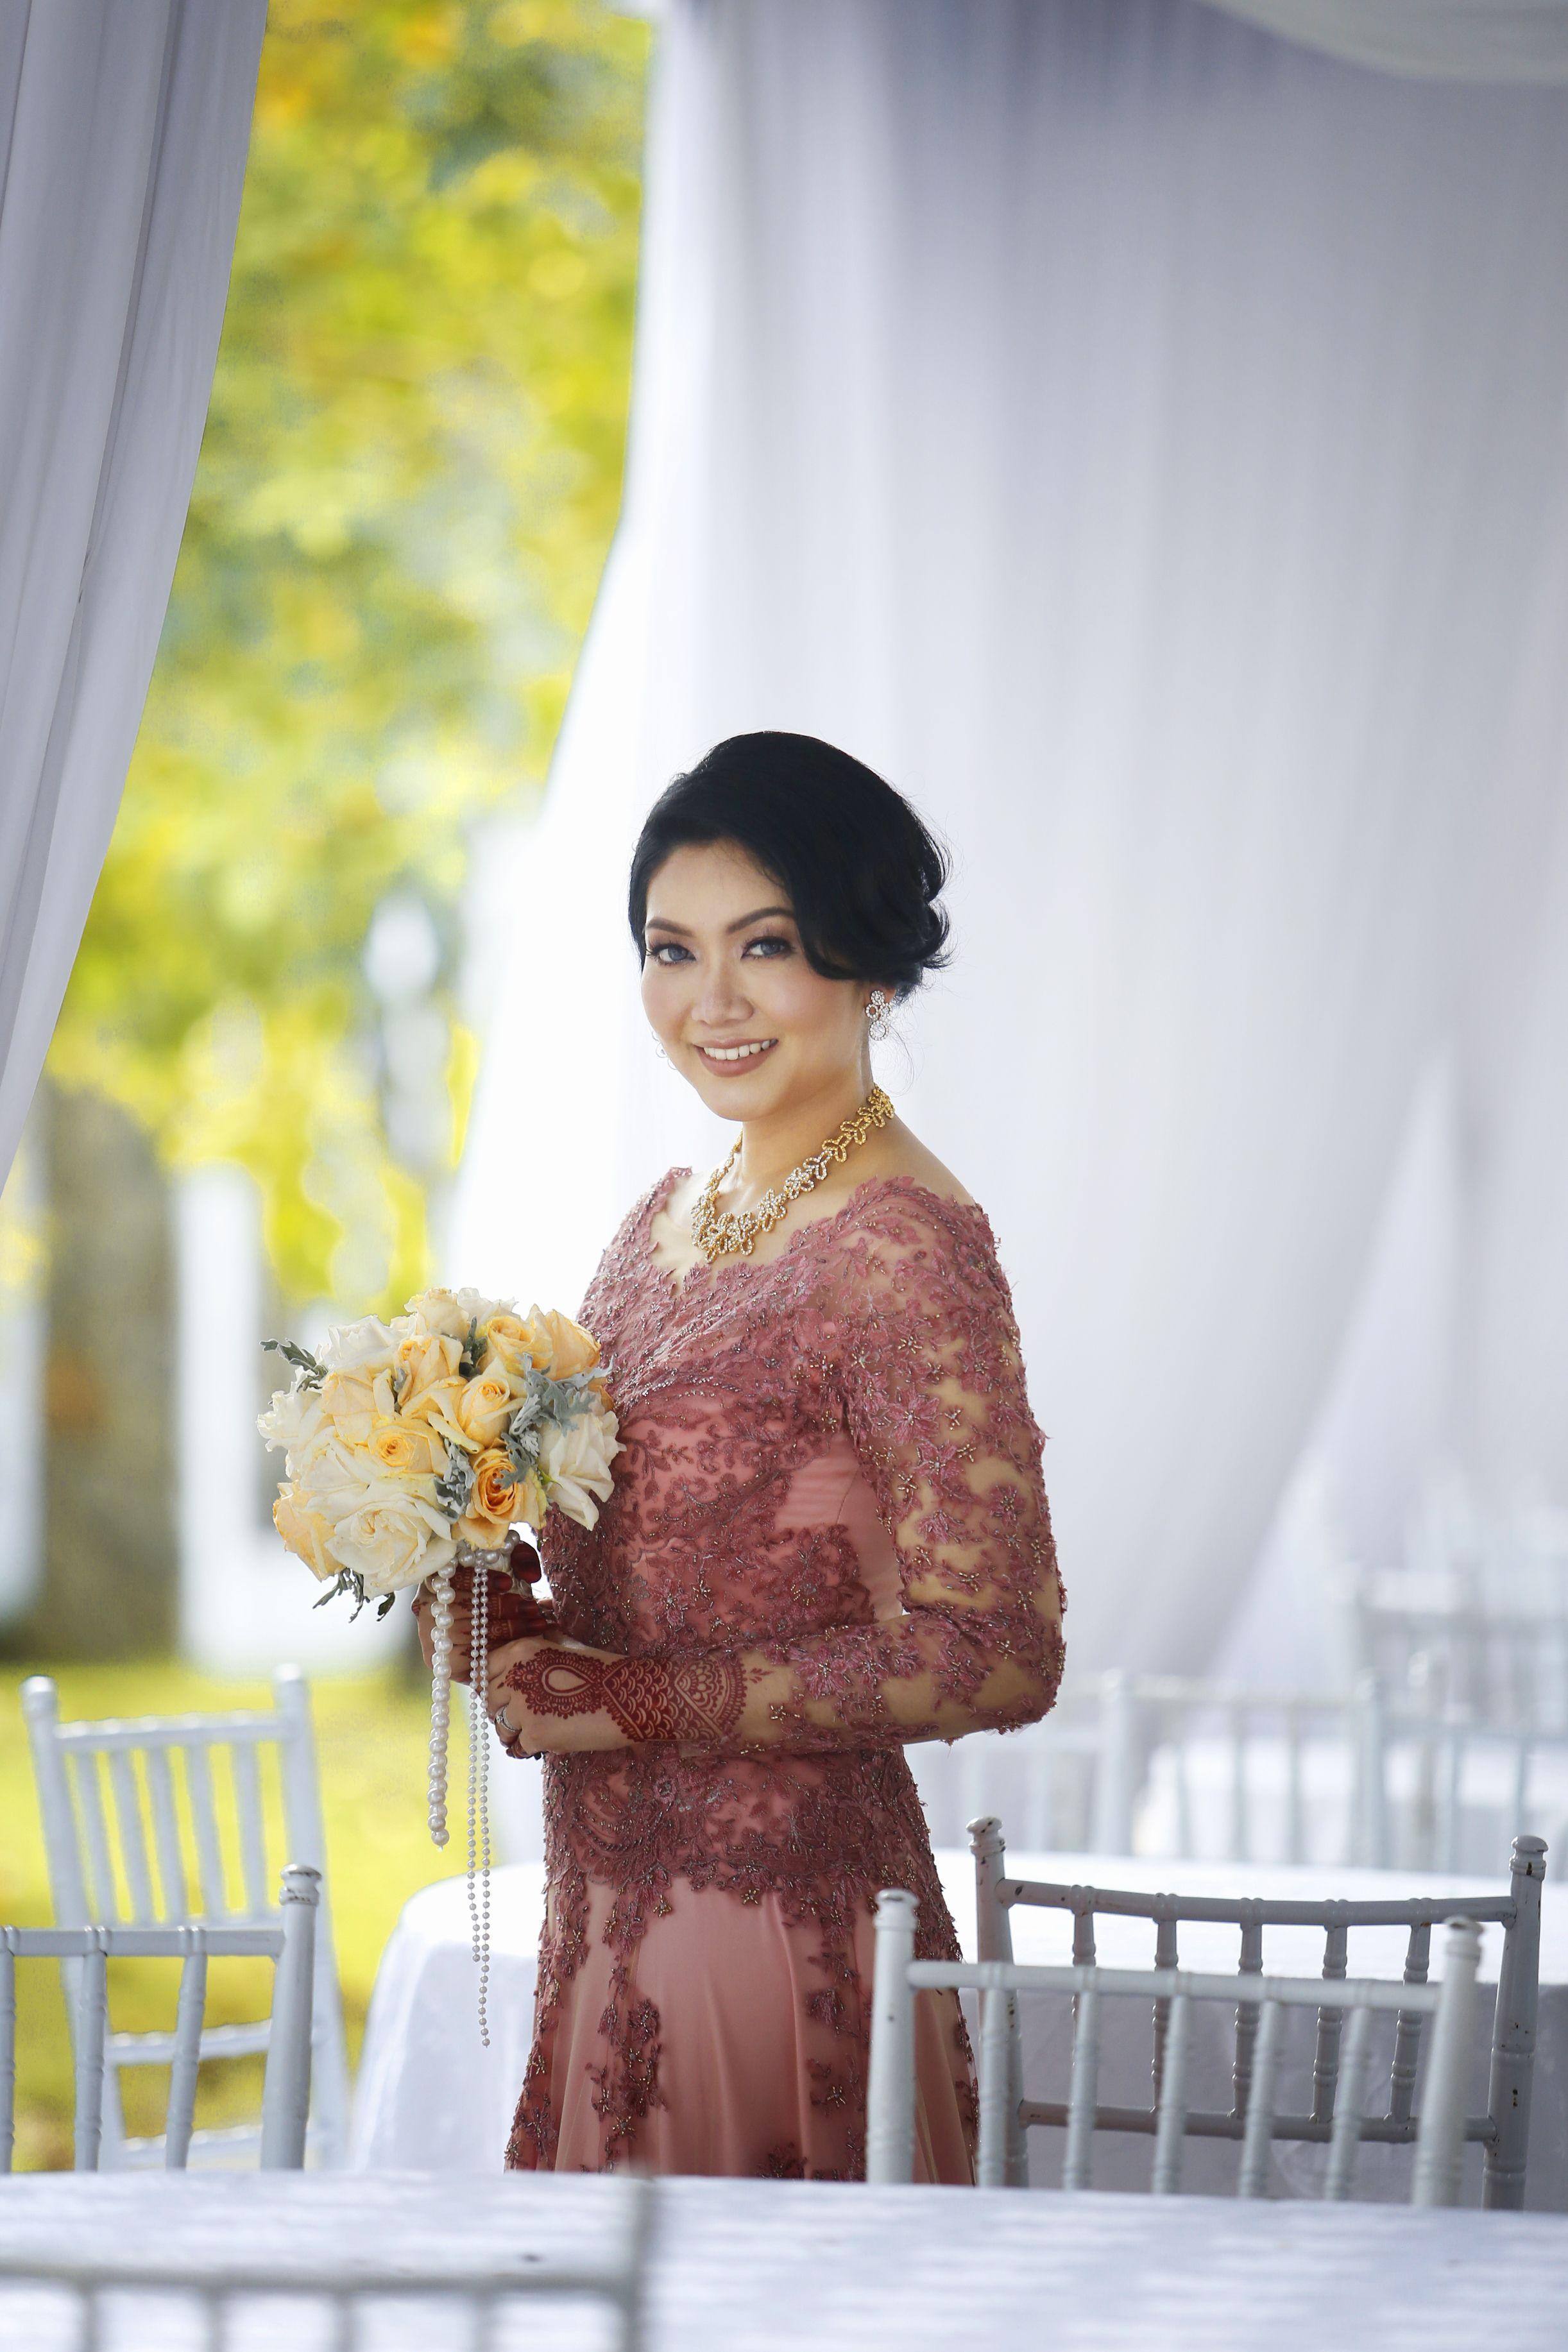 Malaysian Wedding www.nazimzafri.com   Malaysian Wedding   Pinterest ...